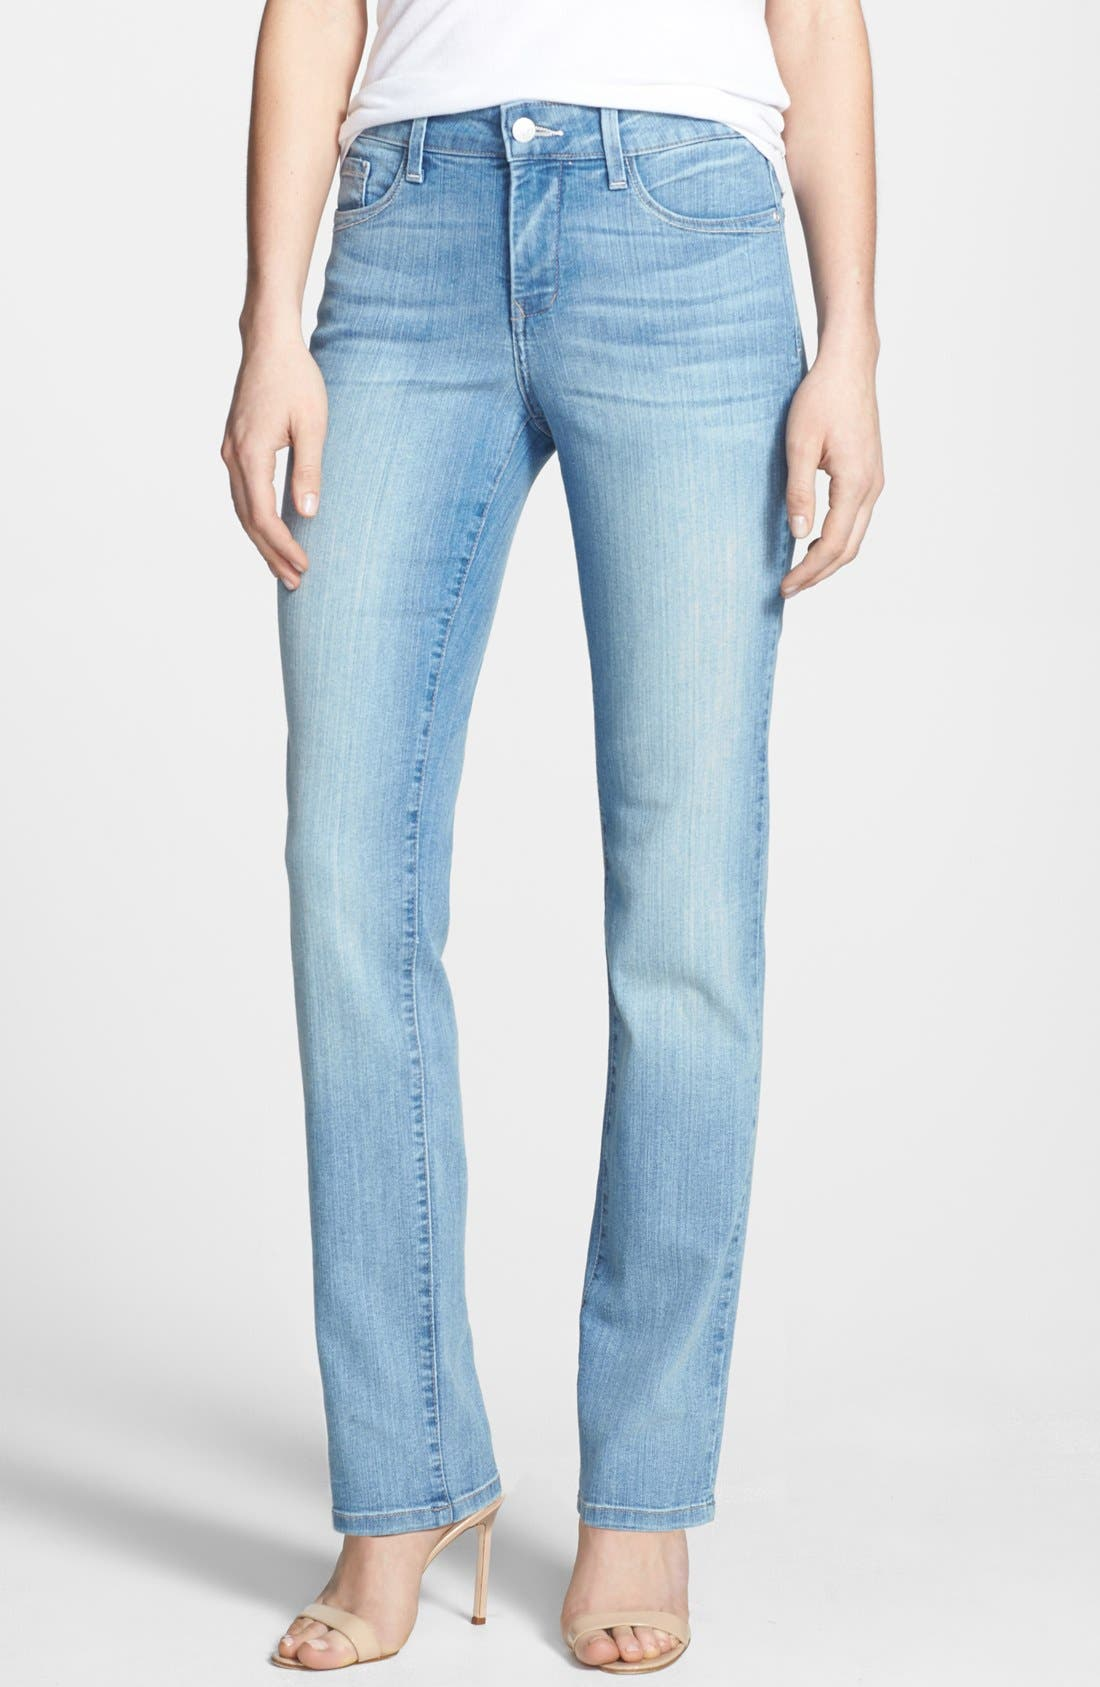 Main Image - NYDJ 'Sheri' Stretch Skinny Jeans (Manhattan Beach)